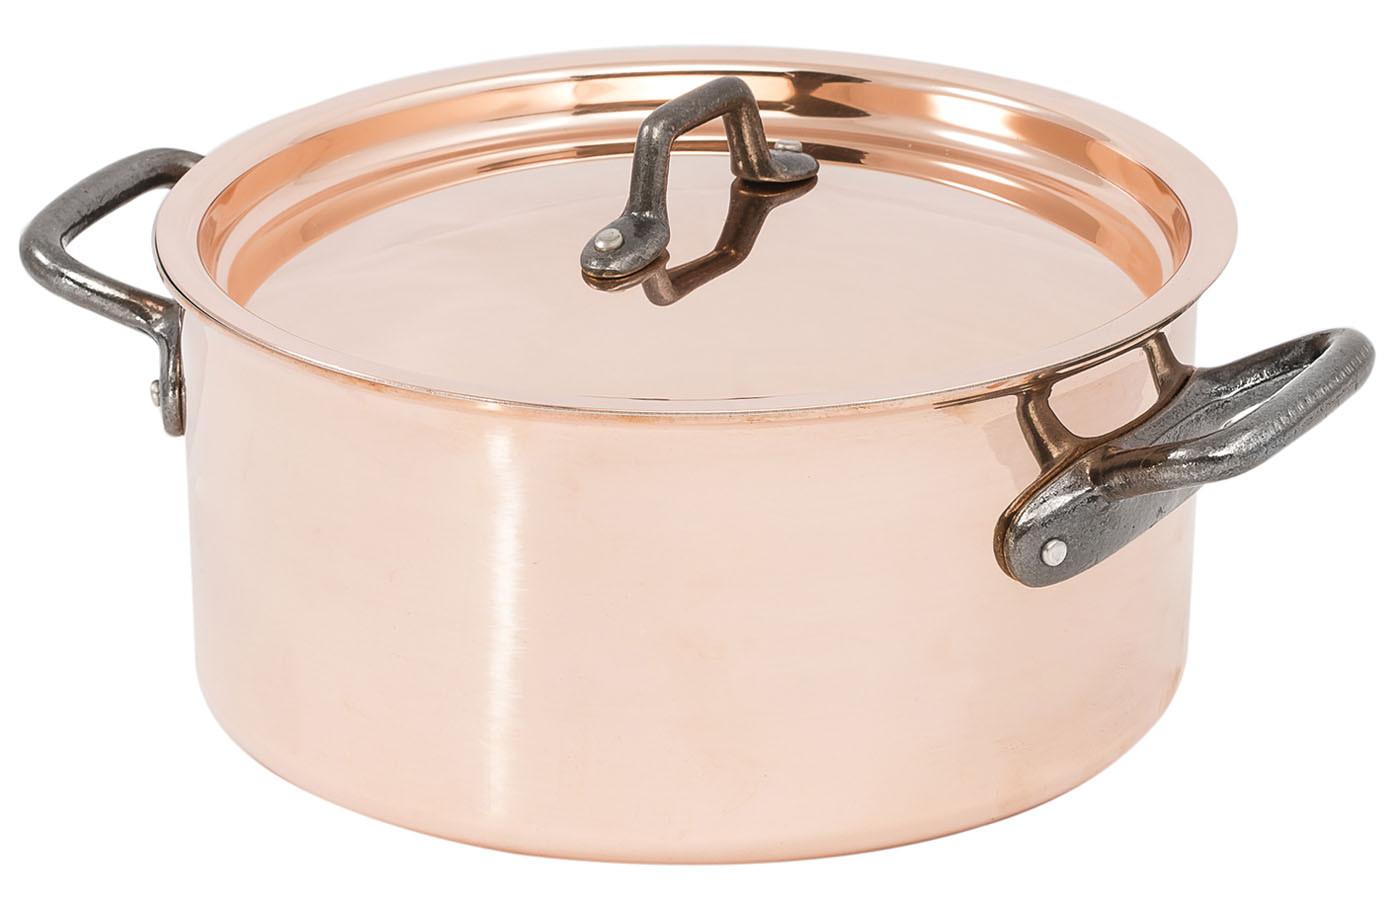 Bourgeat Casserole - Stewpan w/Lid